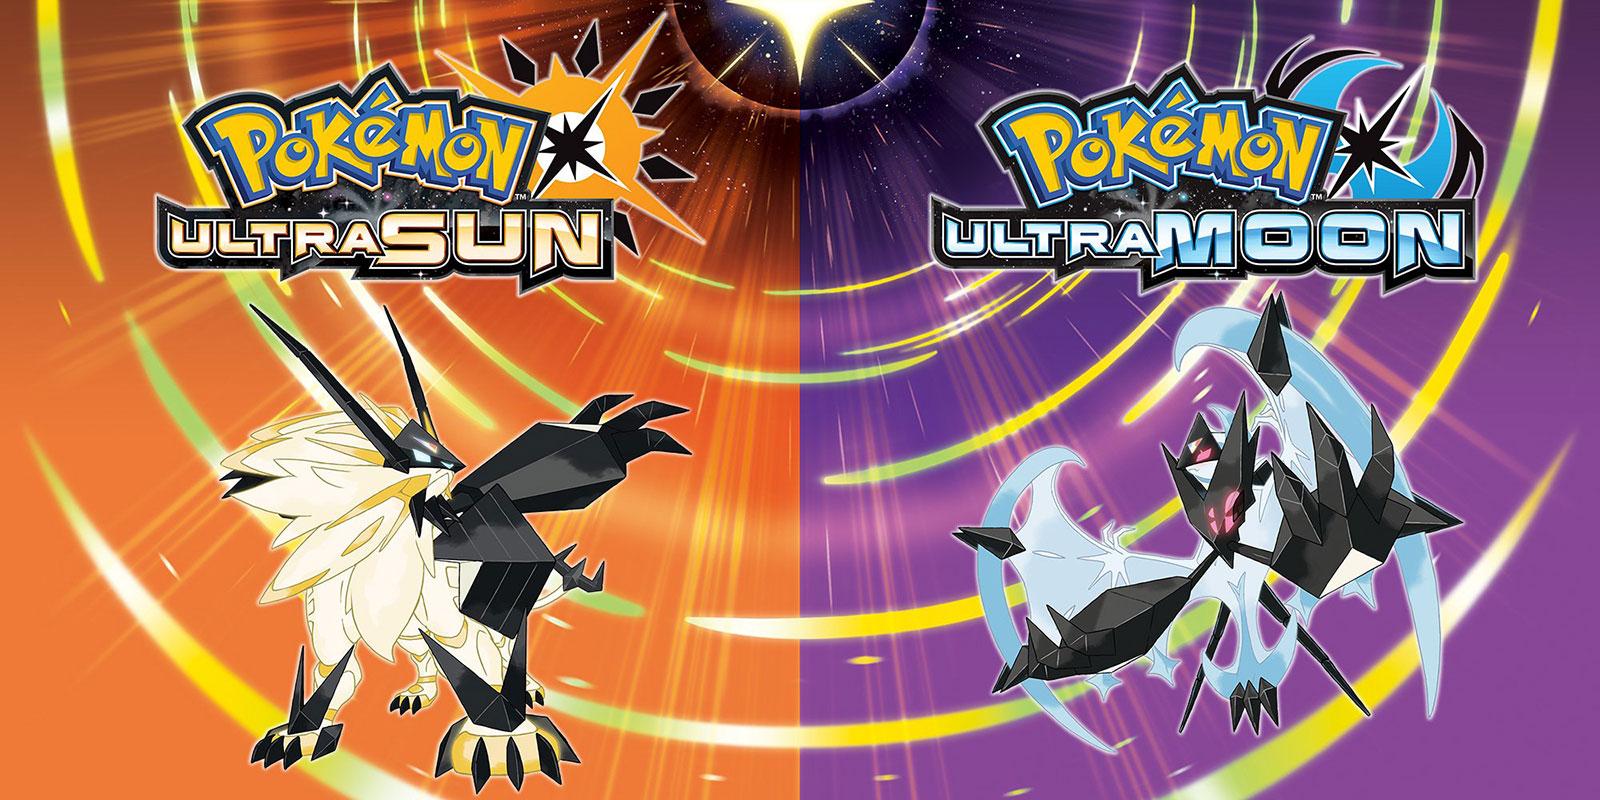 Game Review: Pokemon Ultra Sun & Ultra Moon